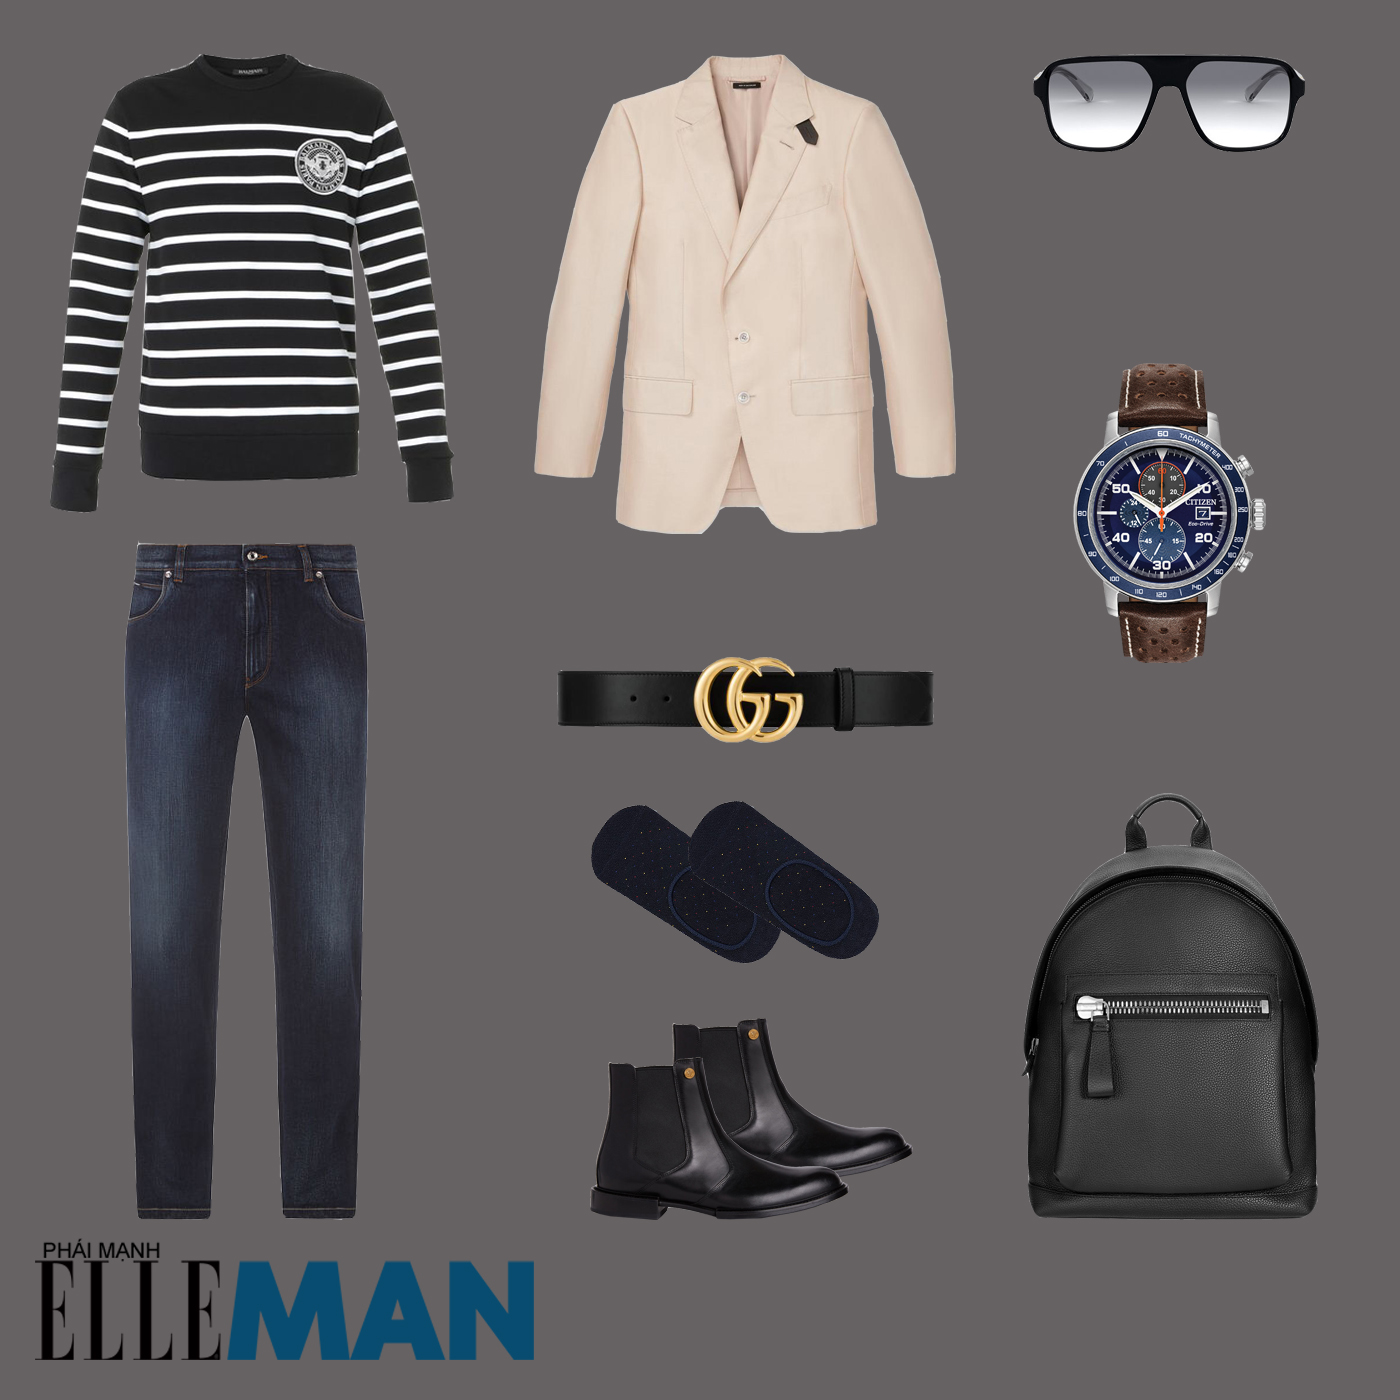 outfit 4 - phối đồ phong cách smart-casual